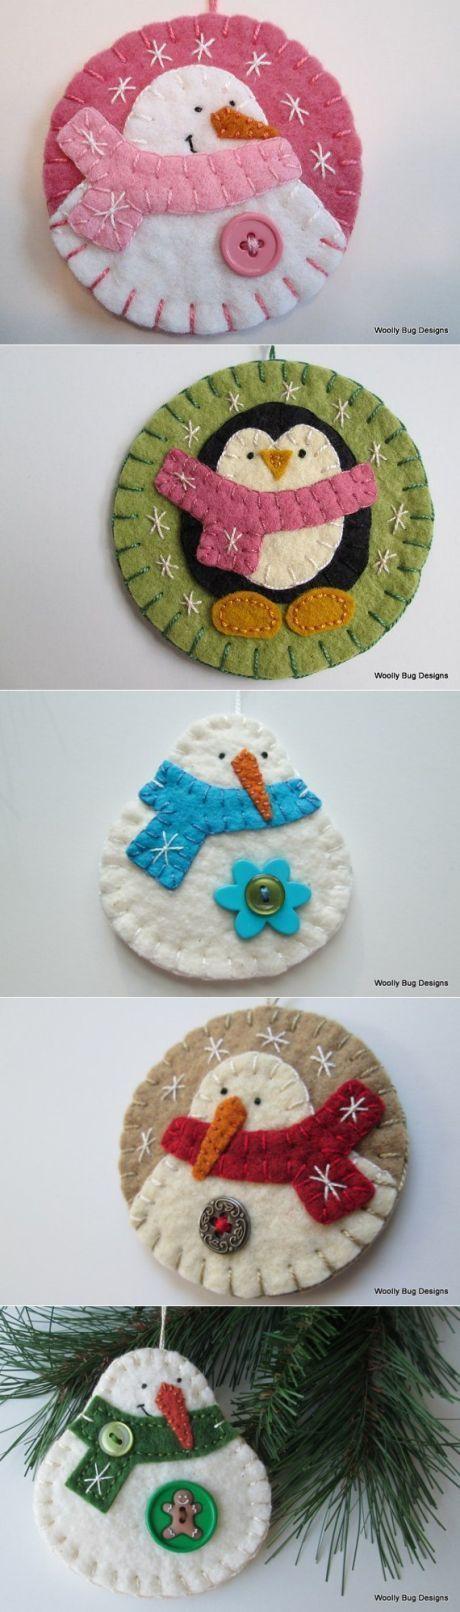 Toys from felt on a fir-tree. Ideas for inspiration.